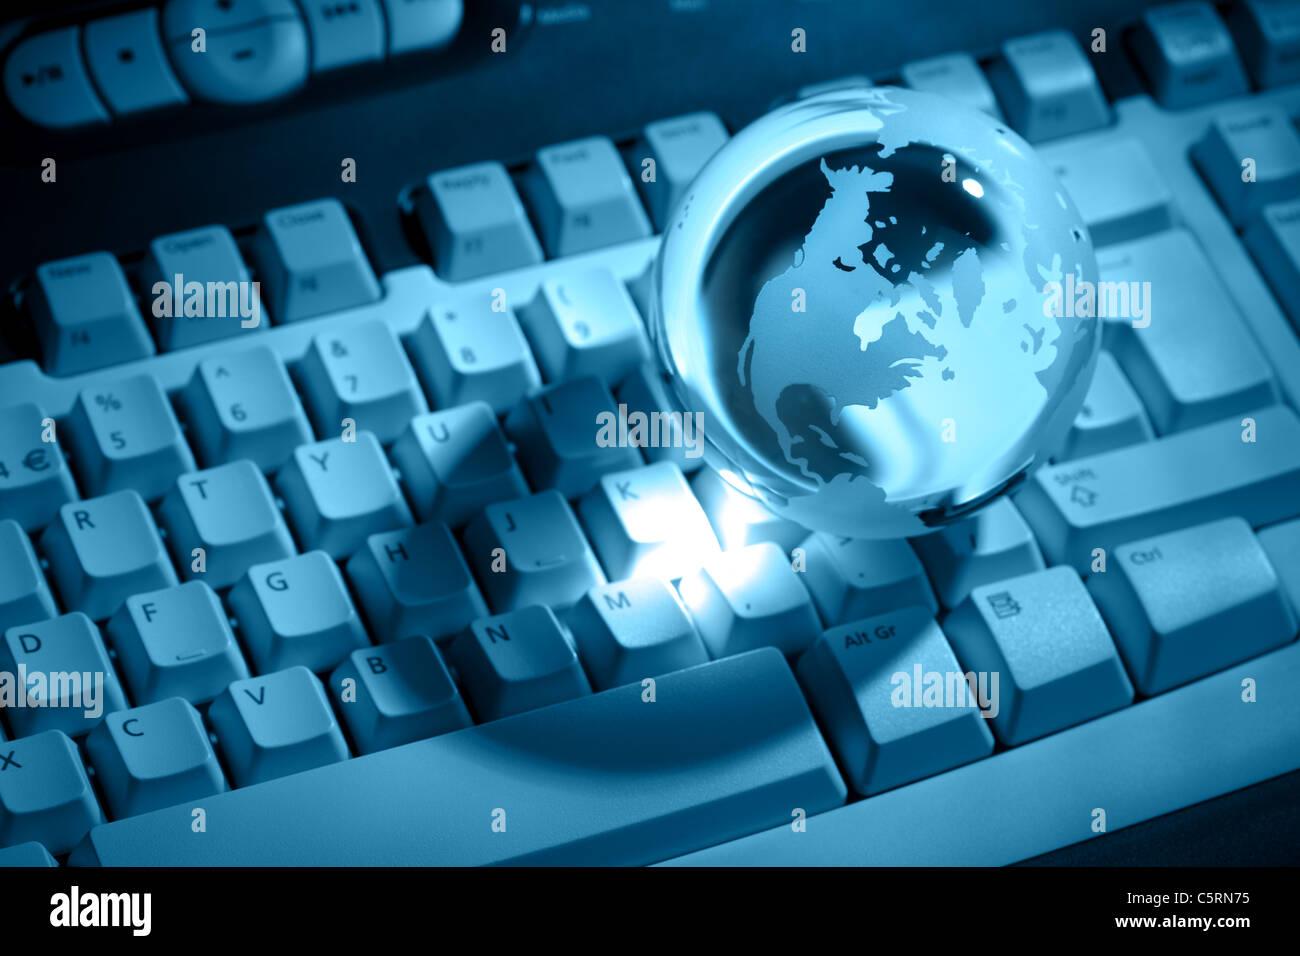 Crystal globe on keyboard - Stock Image